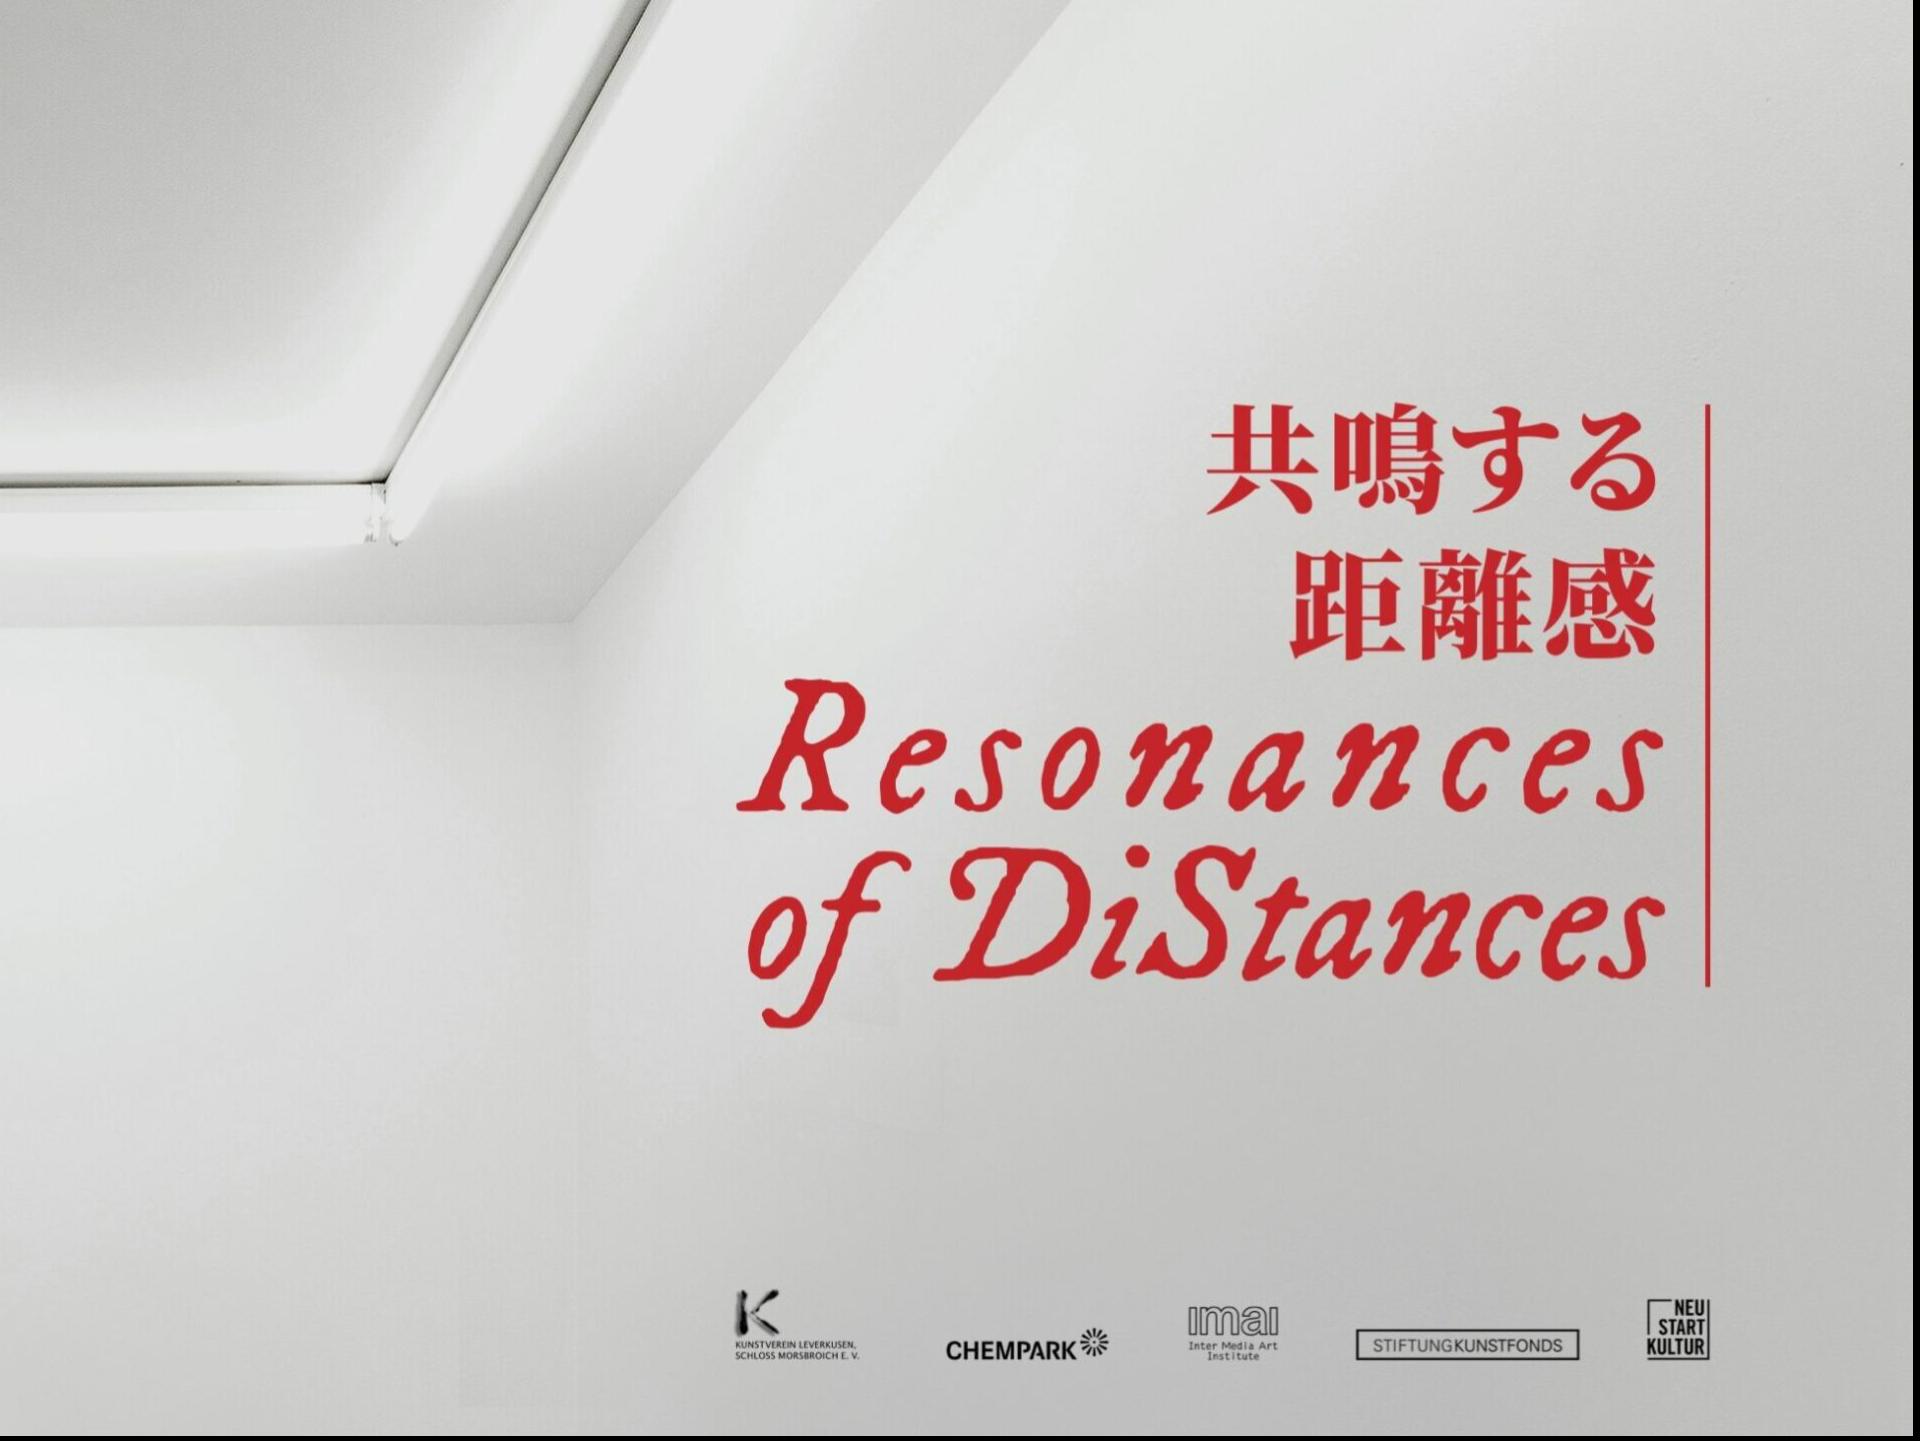 Resonances od DiStances